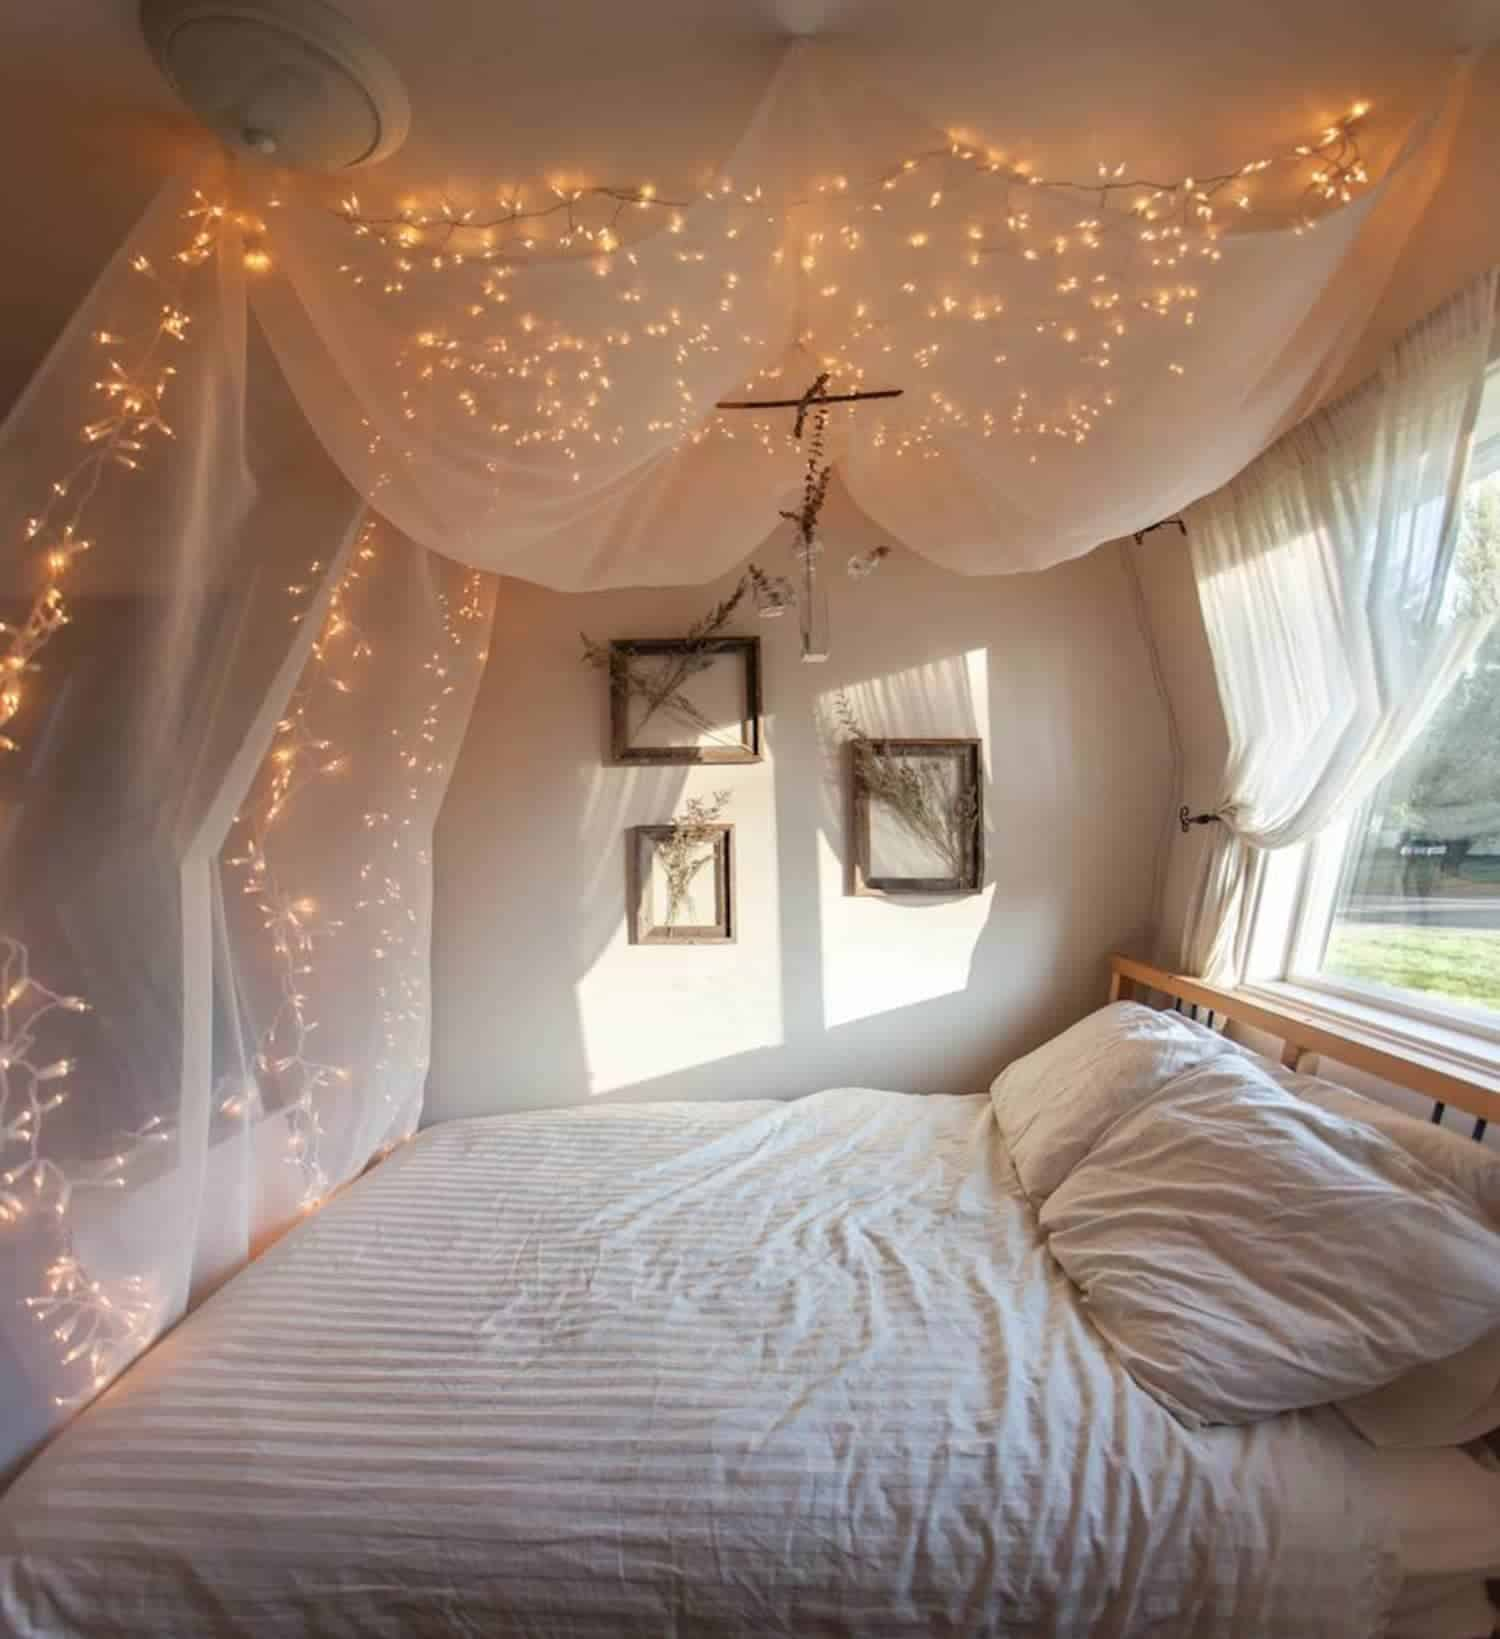 Lumières scintillantes dans la chambre